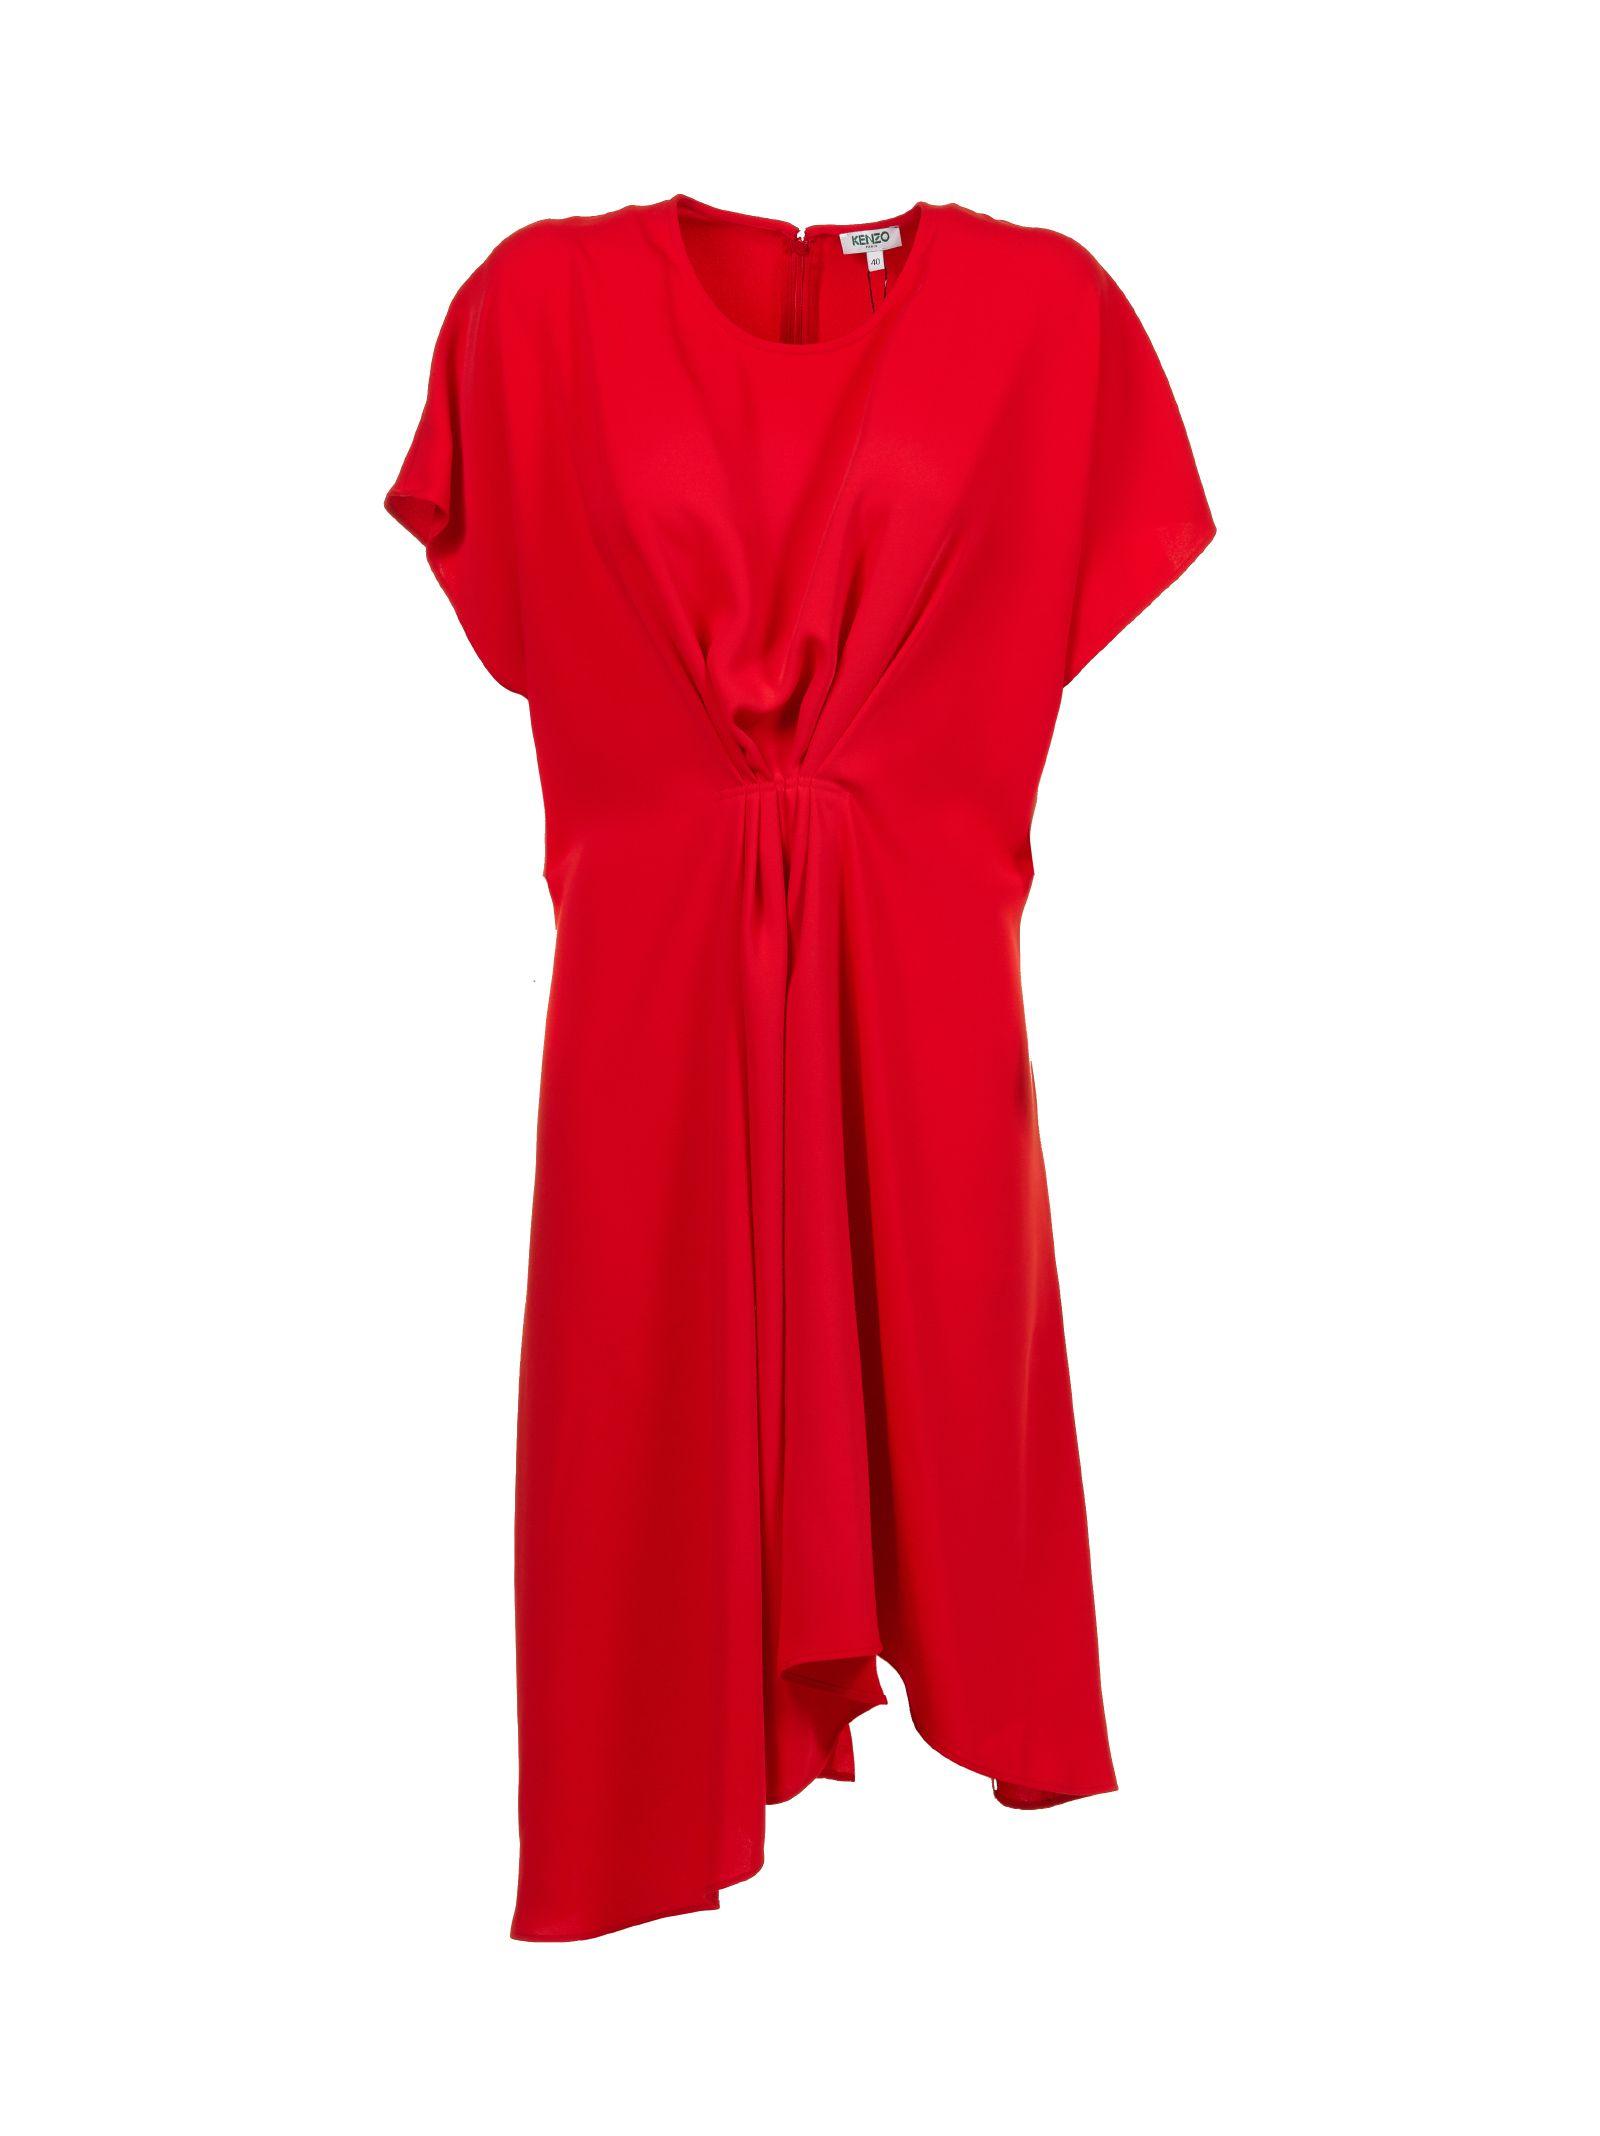 Kenzo Gathered Front Dress